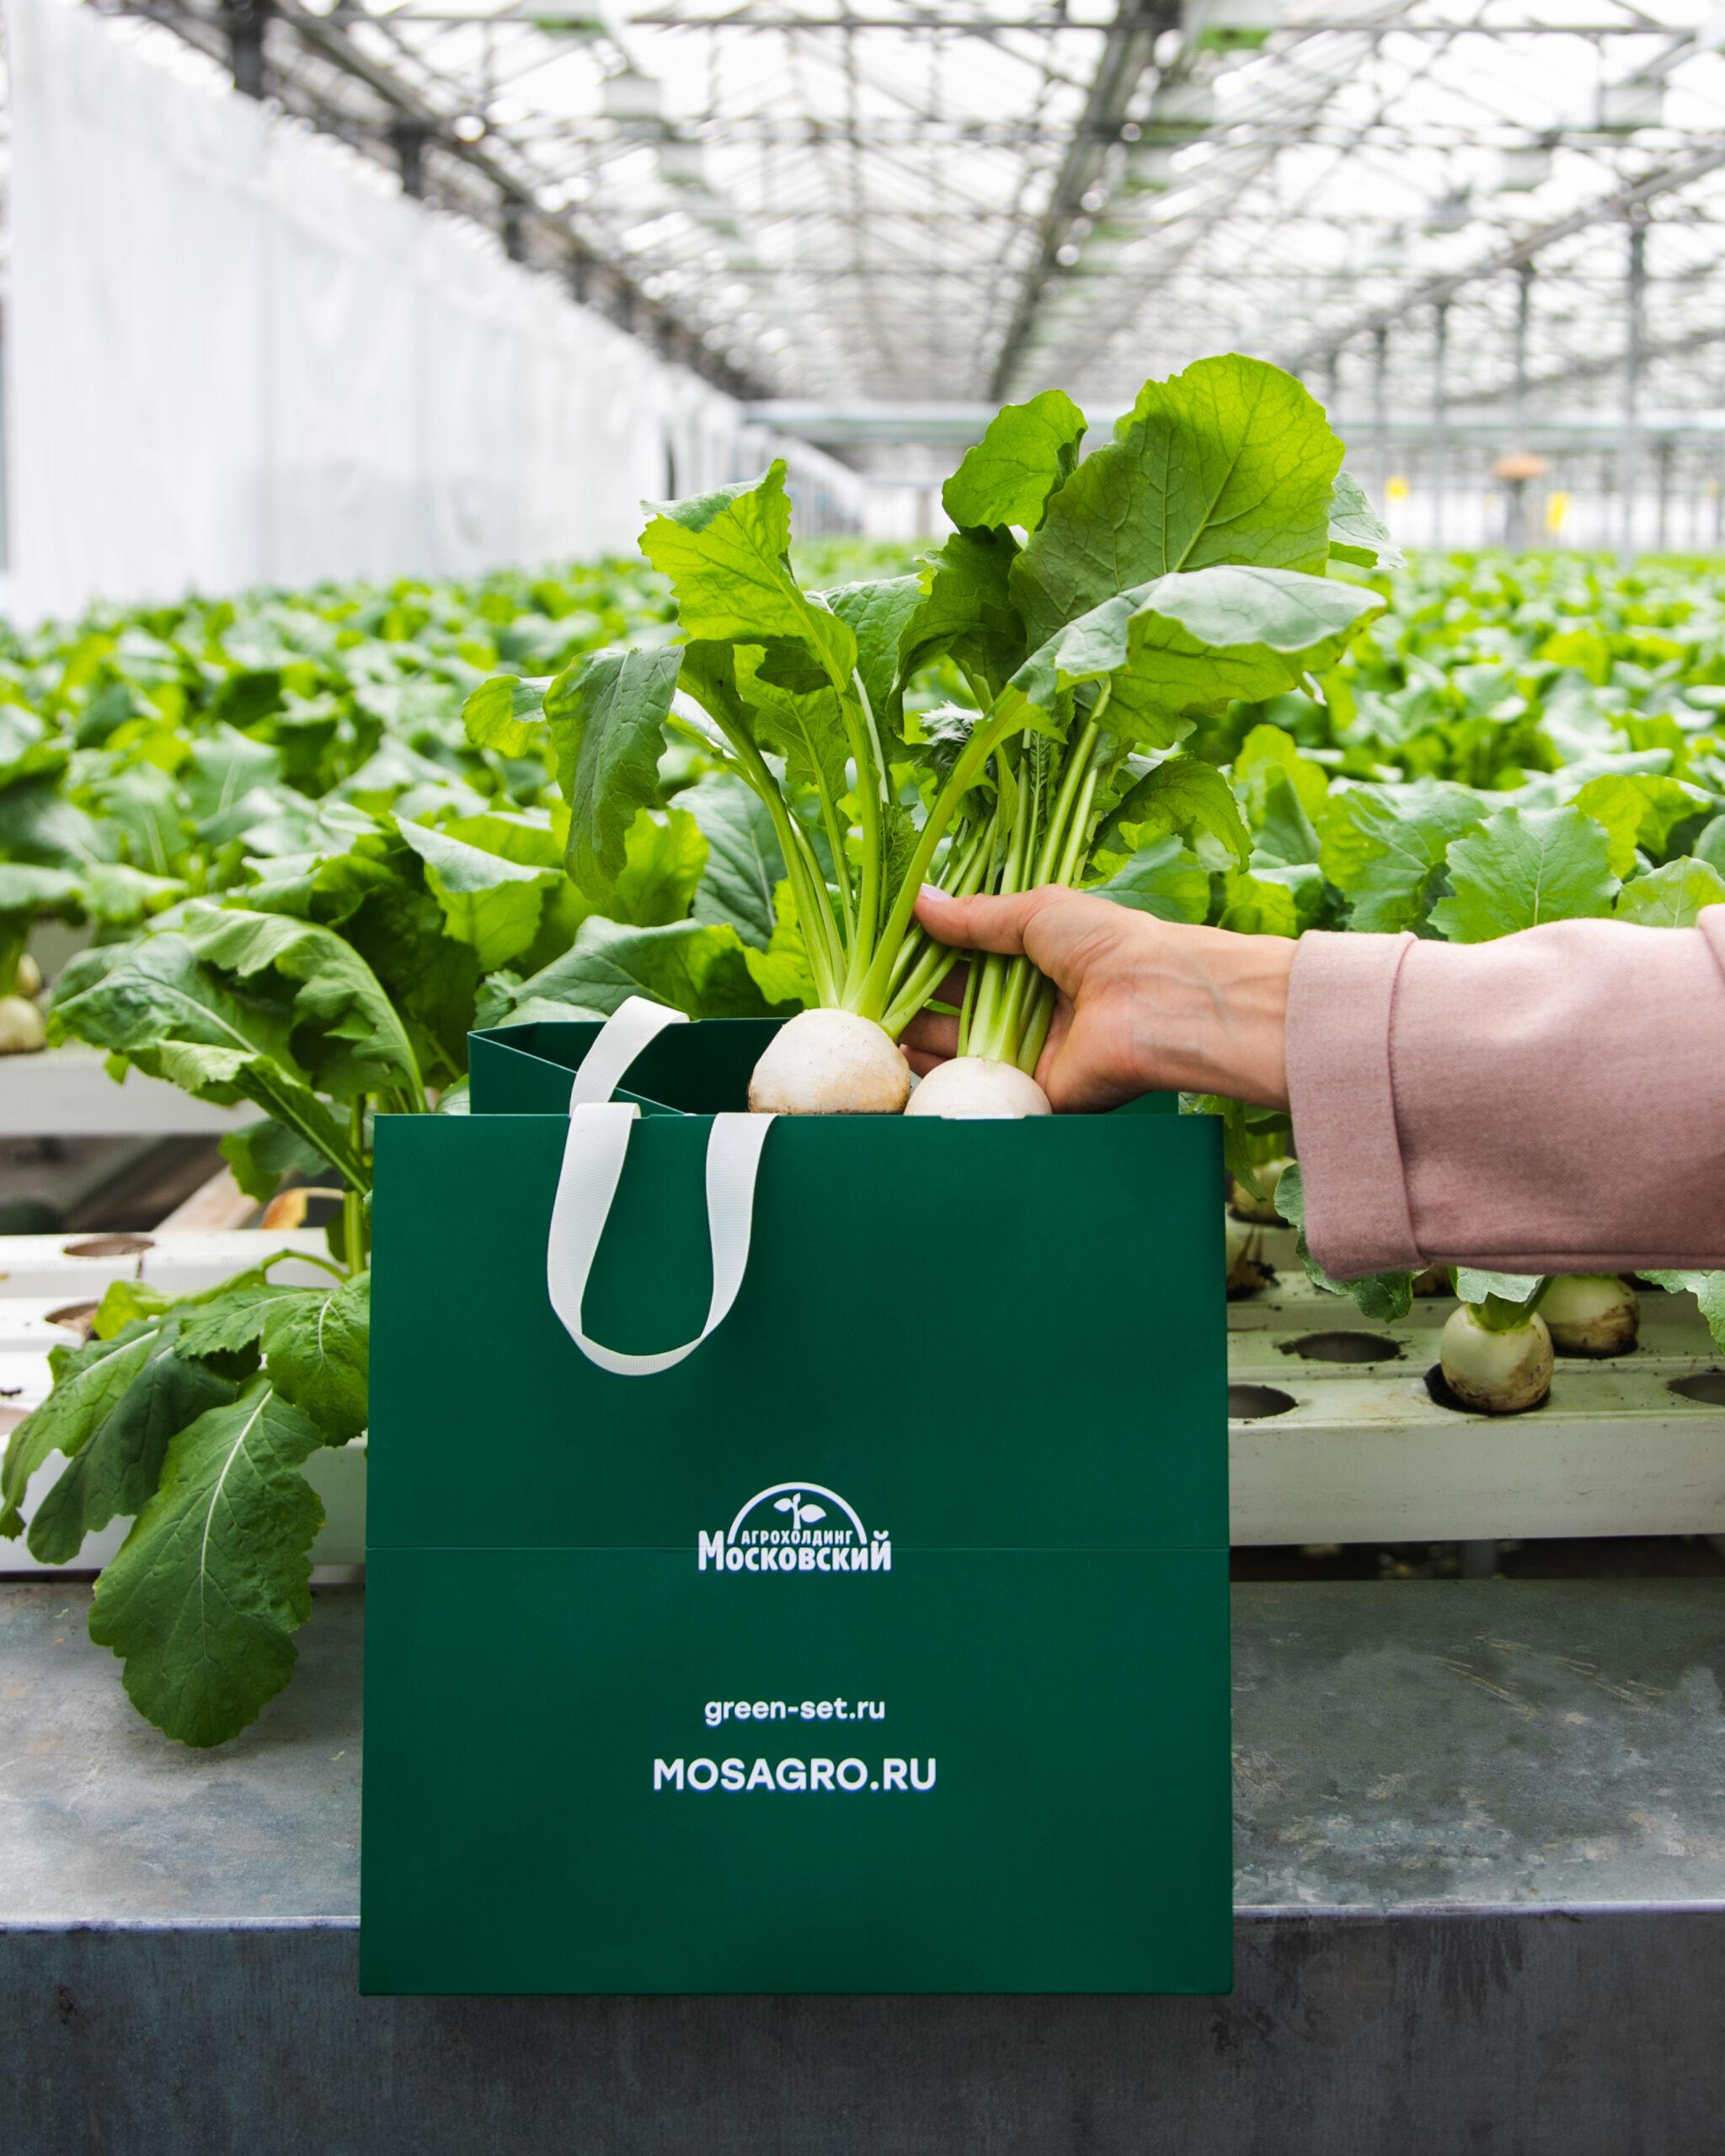 Image cвежие овощи от производителя с доставкой на дом!